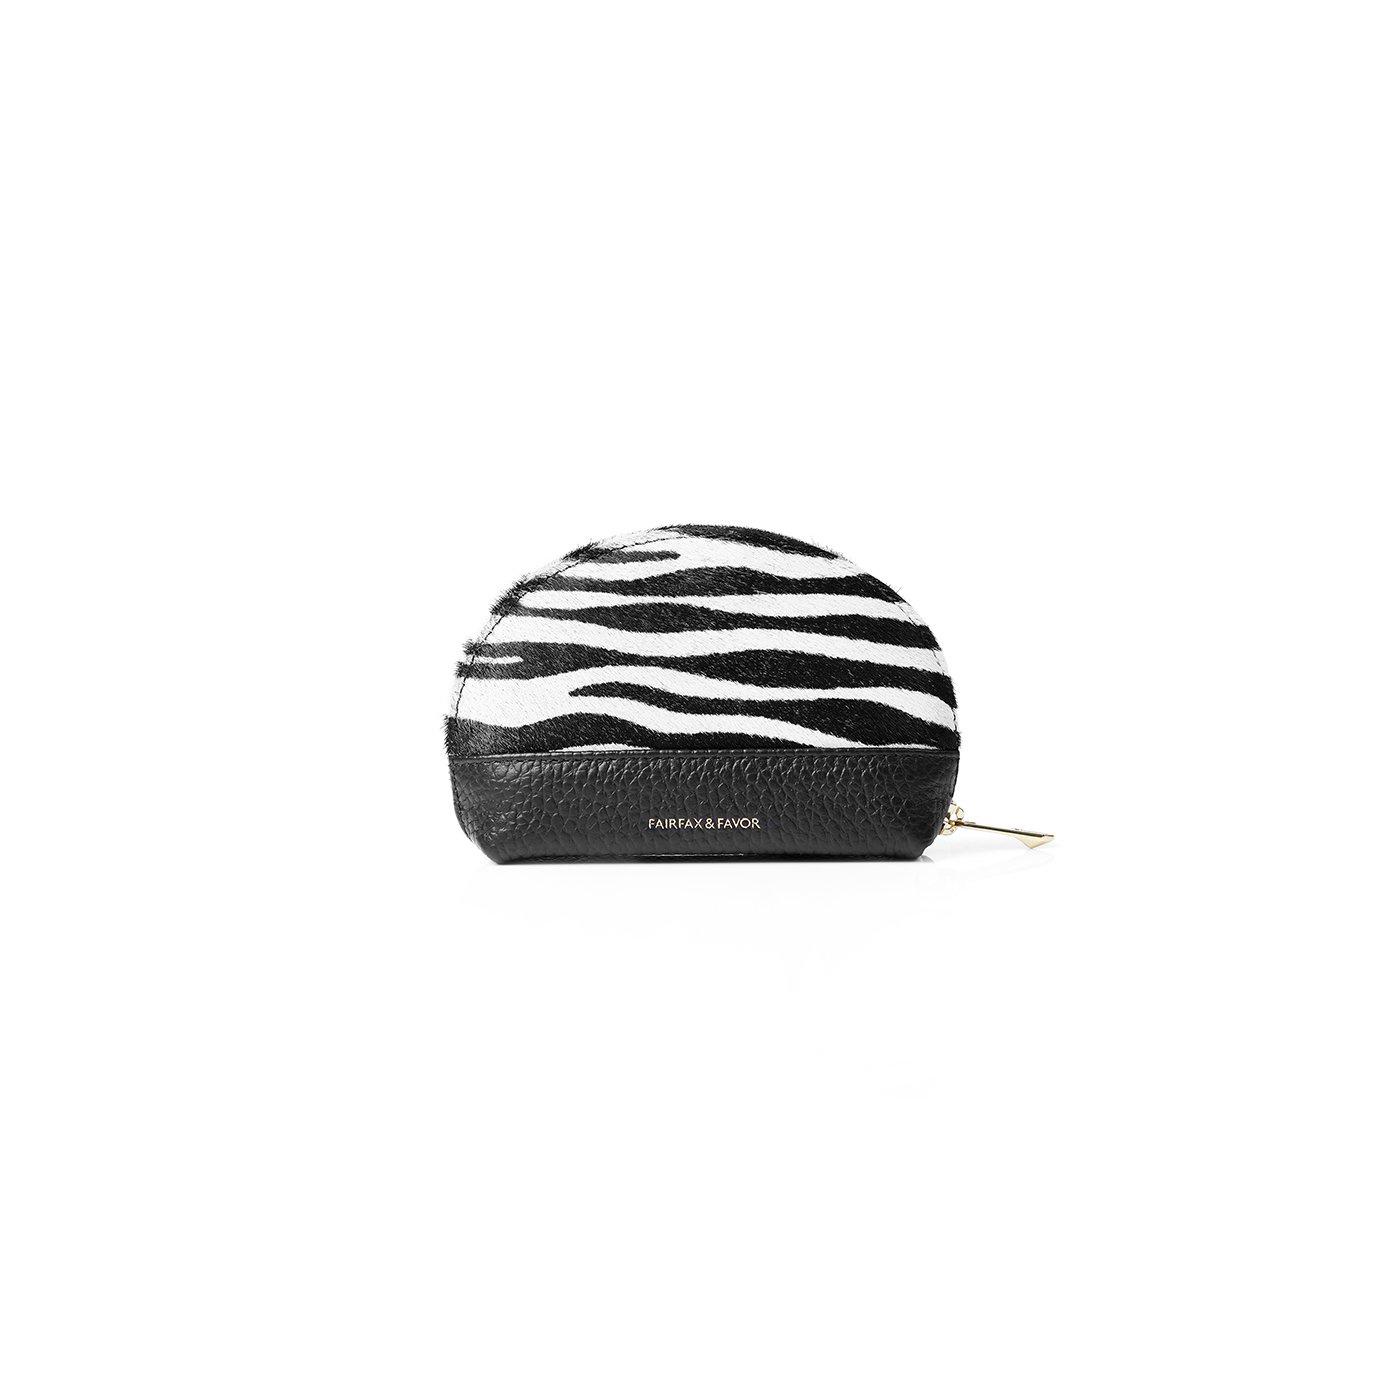 Fairfax & Favor – The Chiltern Coin Purse – Zebra Haircalf/ Black Leather